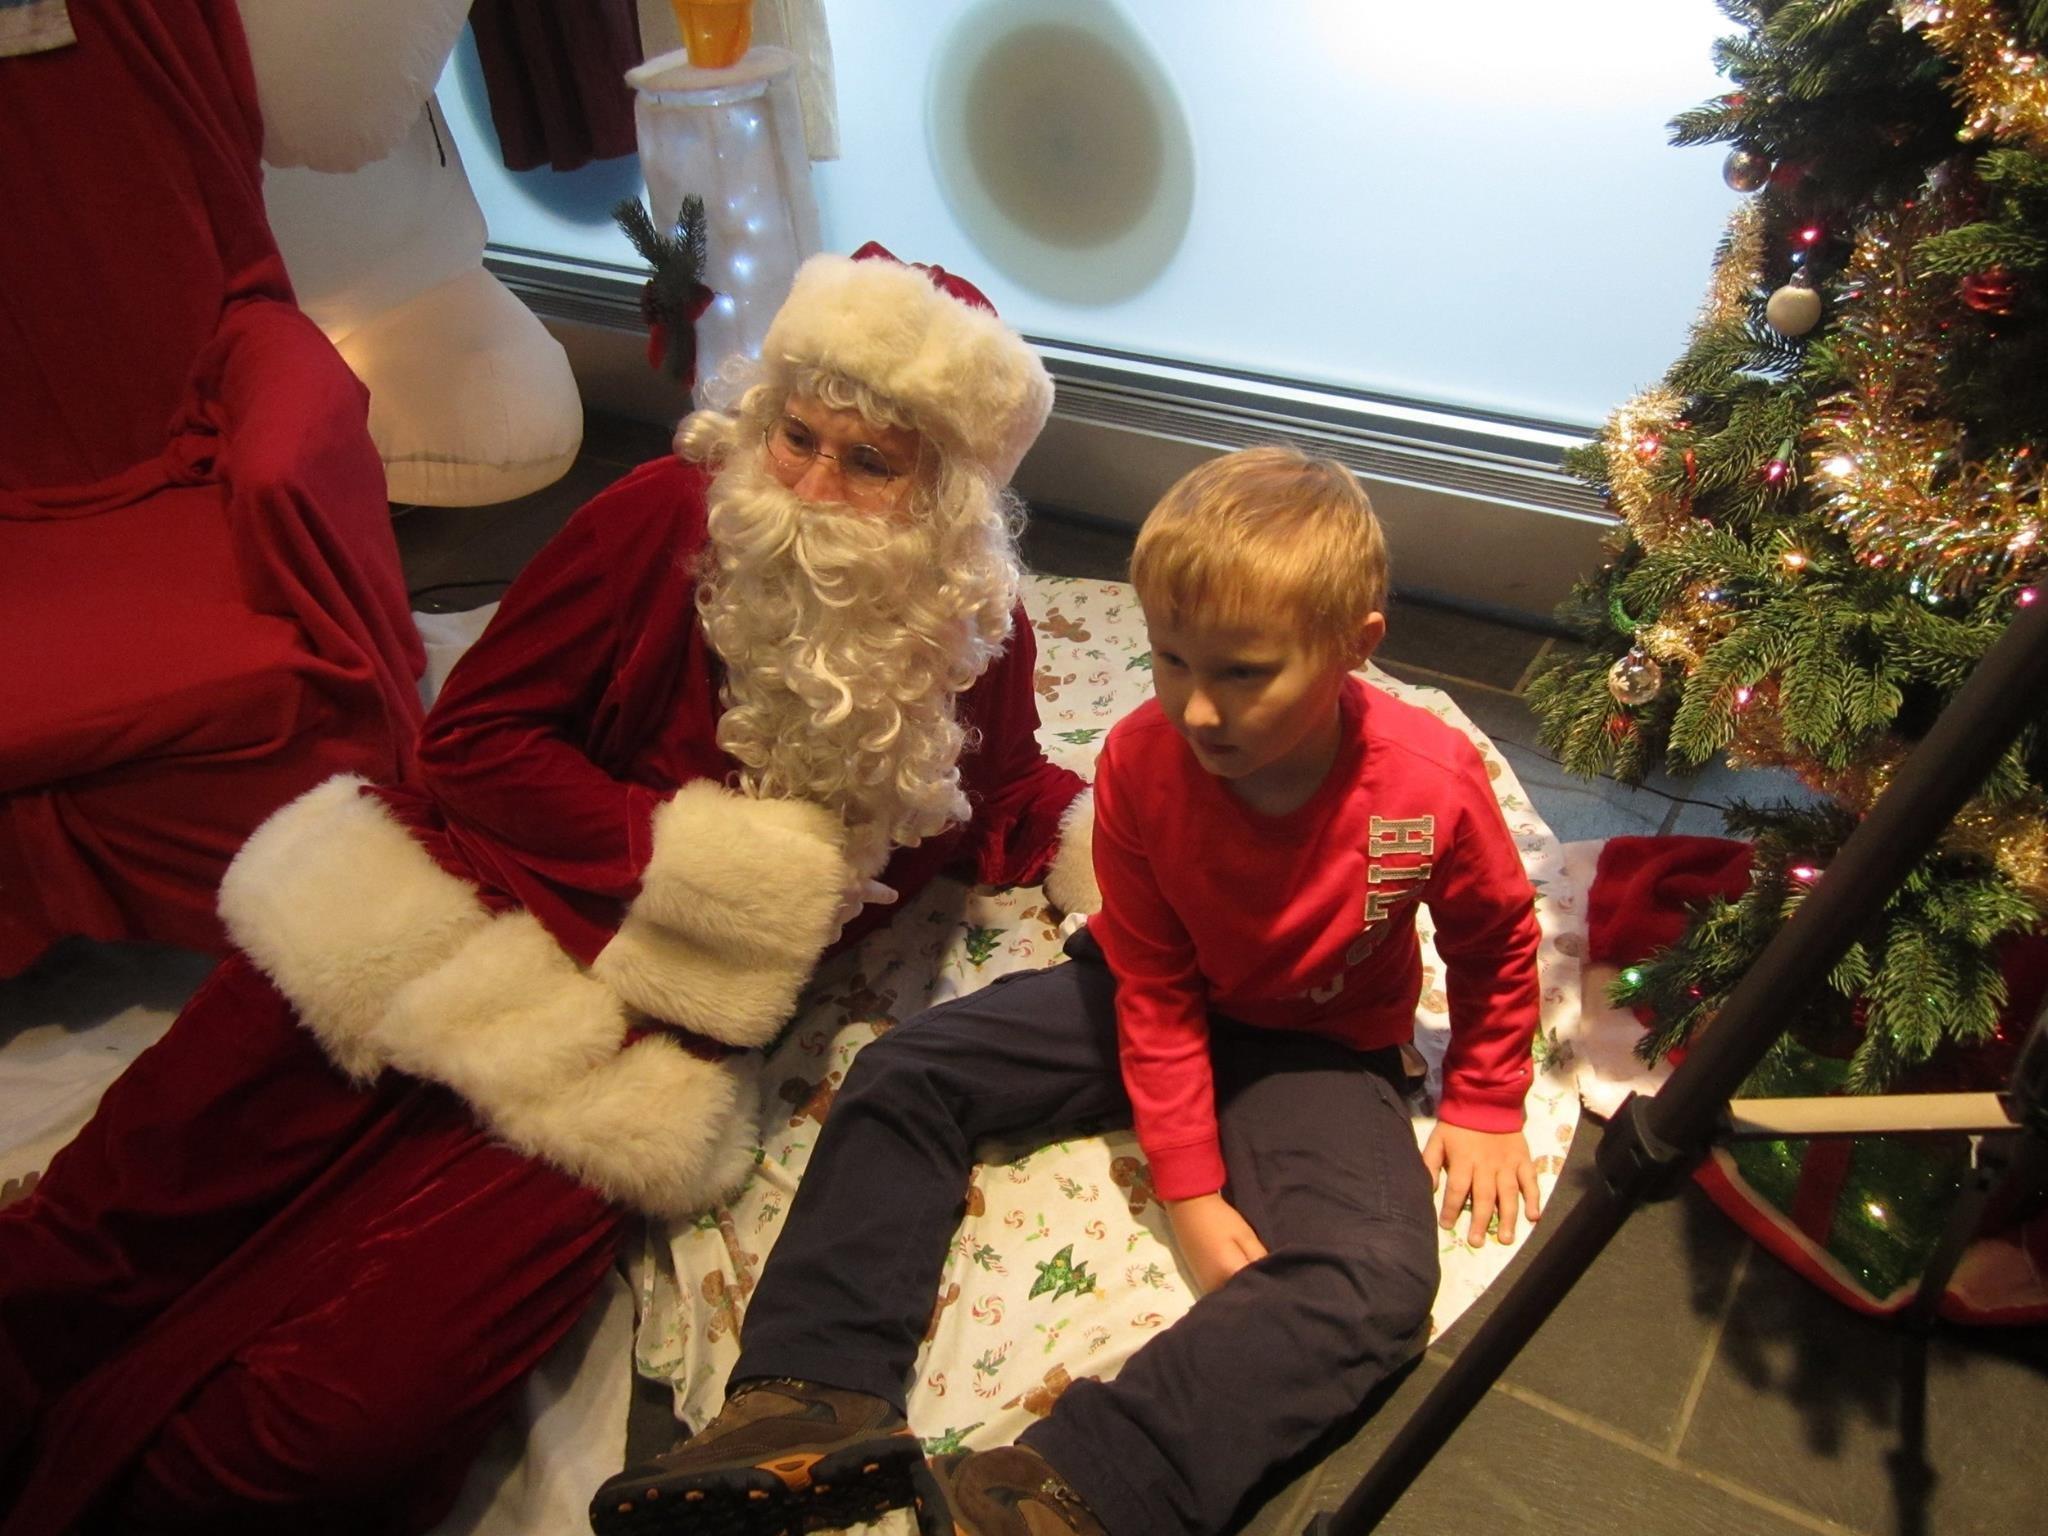 Man With Autism Offers Sensory Friendly Santa Visits So No Kid Misses